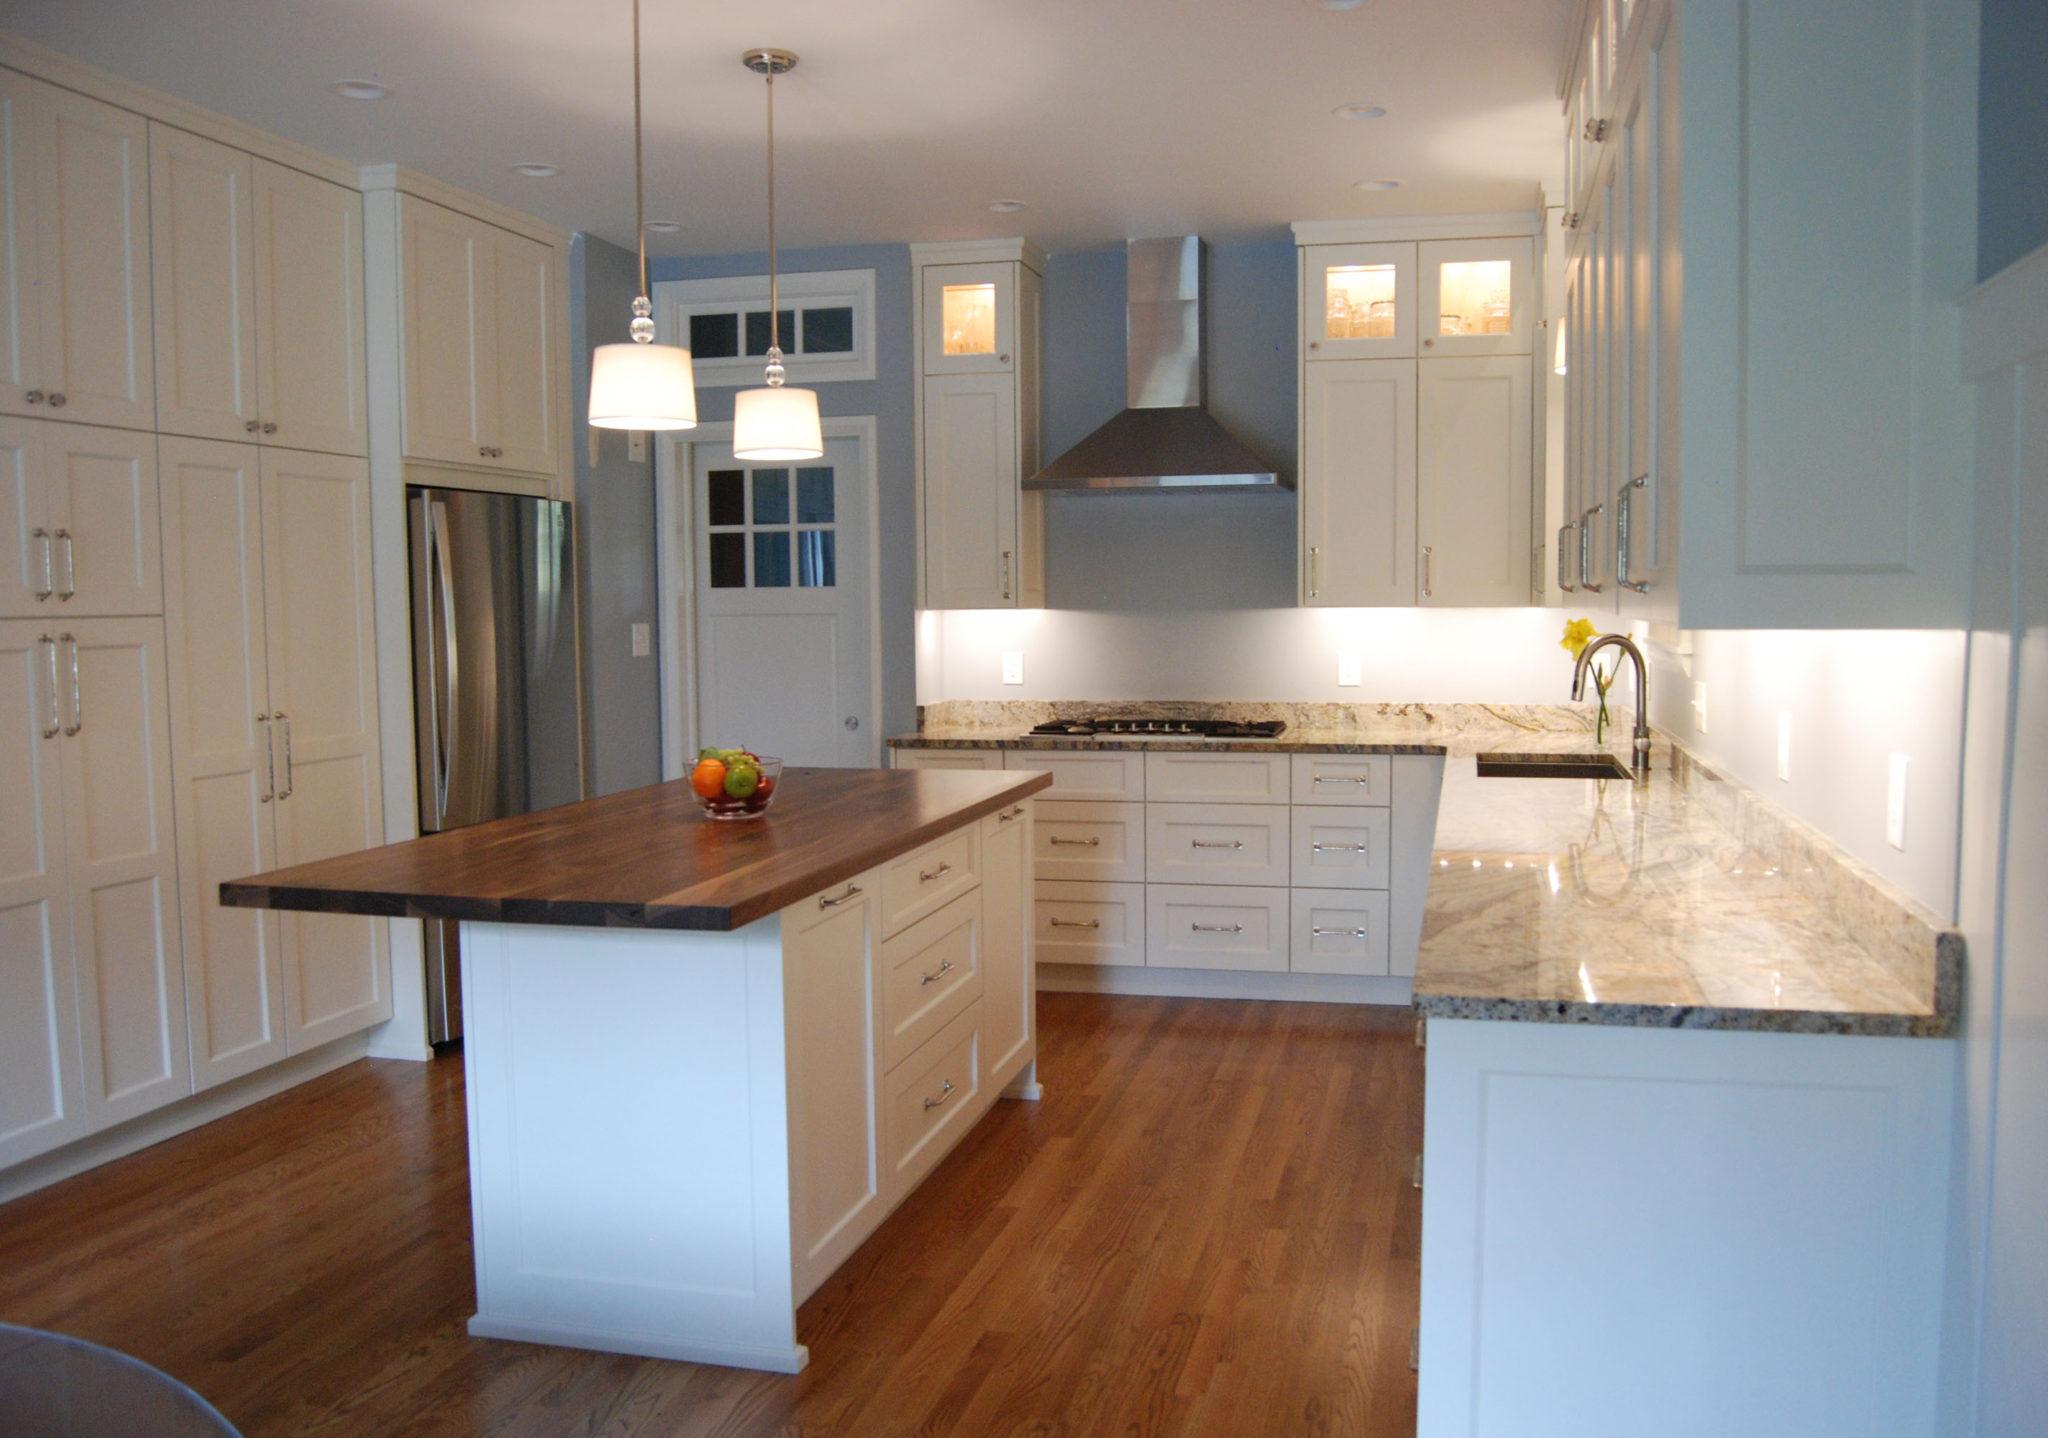 Custom Made Kitchen Cabinet Company - Pure Dimensions